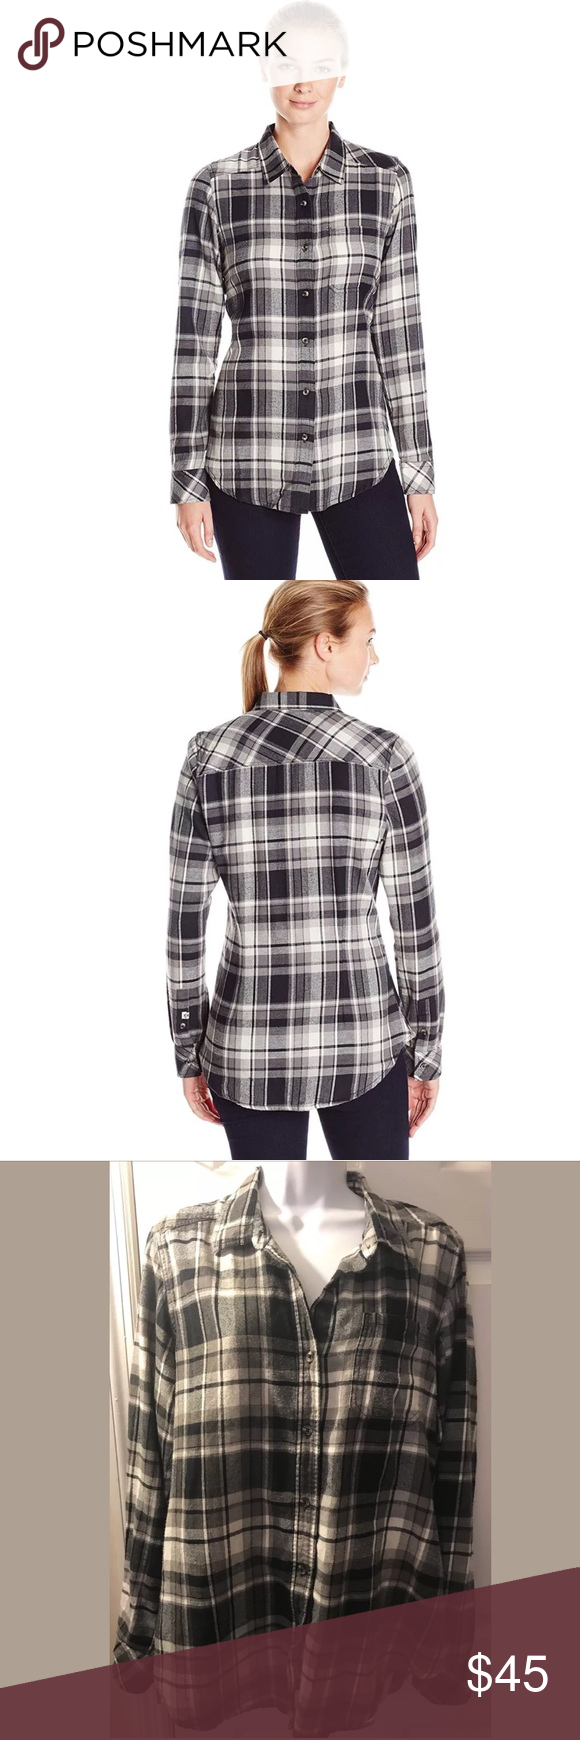 Flannel shirt black  KAVU Flannel Shirt Black White Plaid Button Down  My Posh Closet